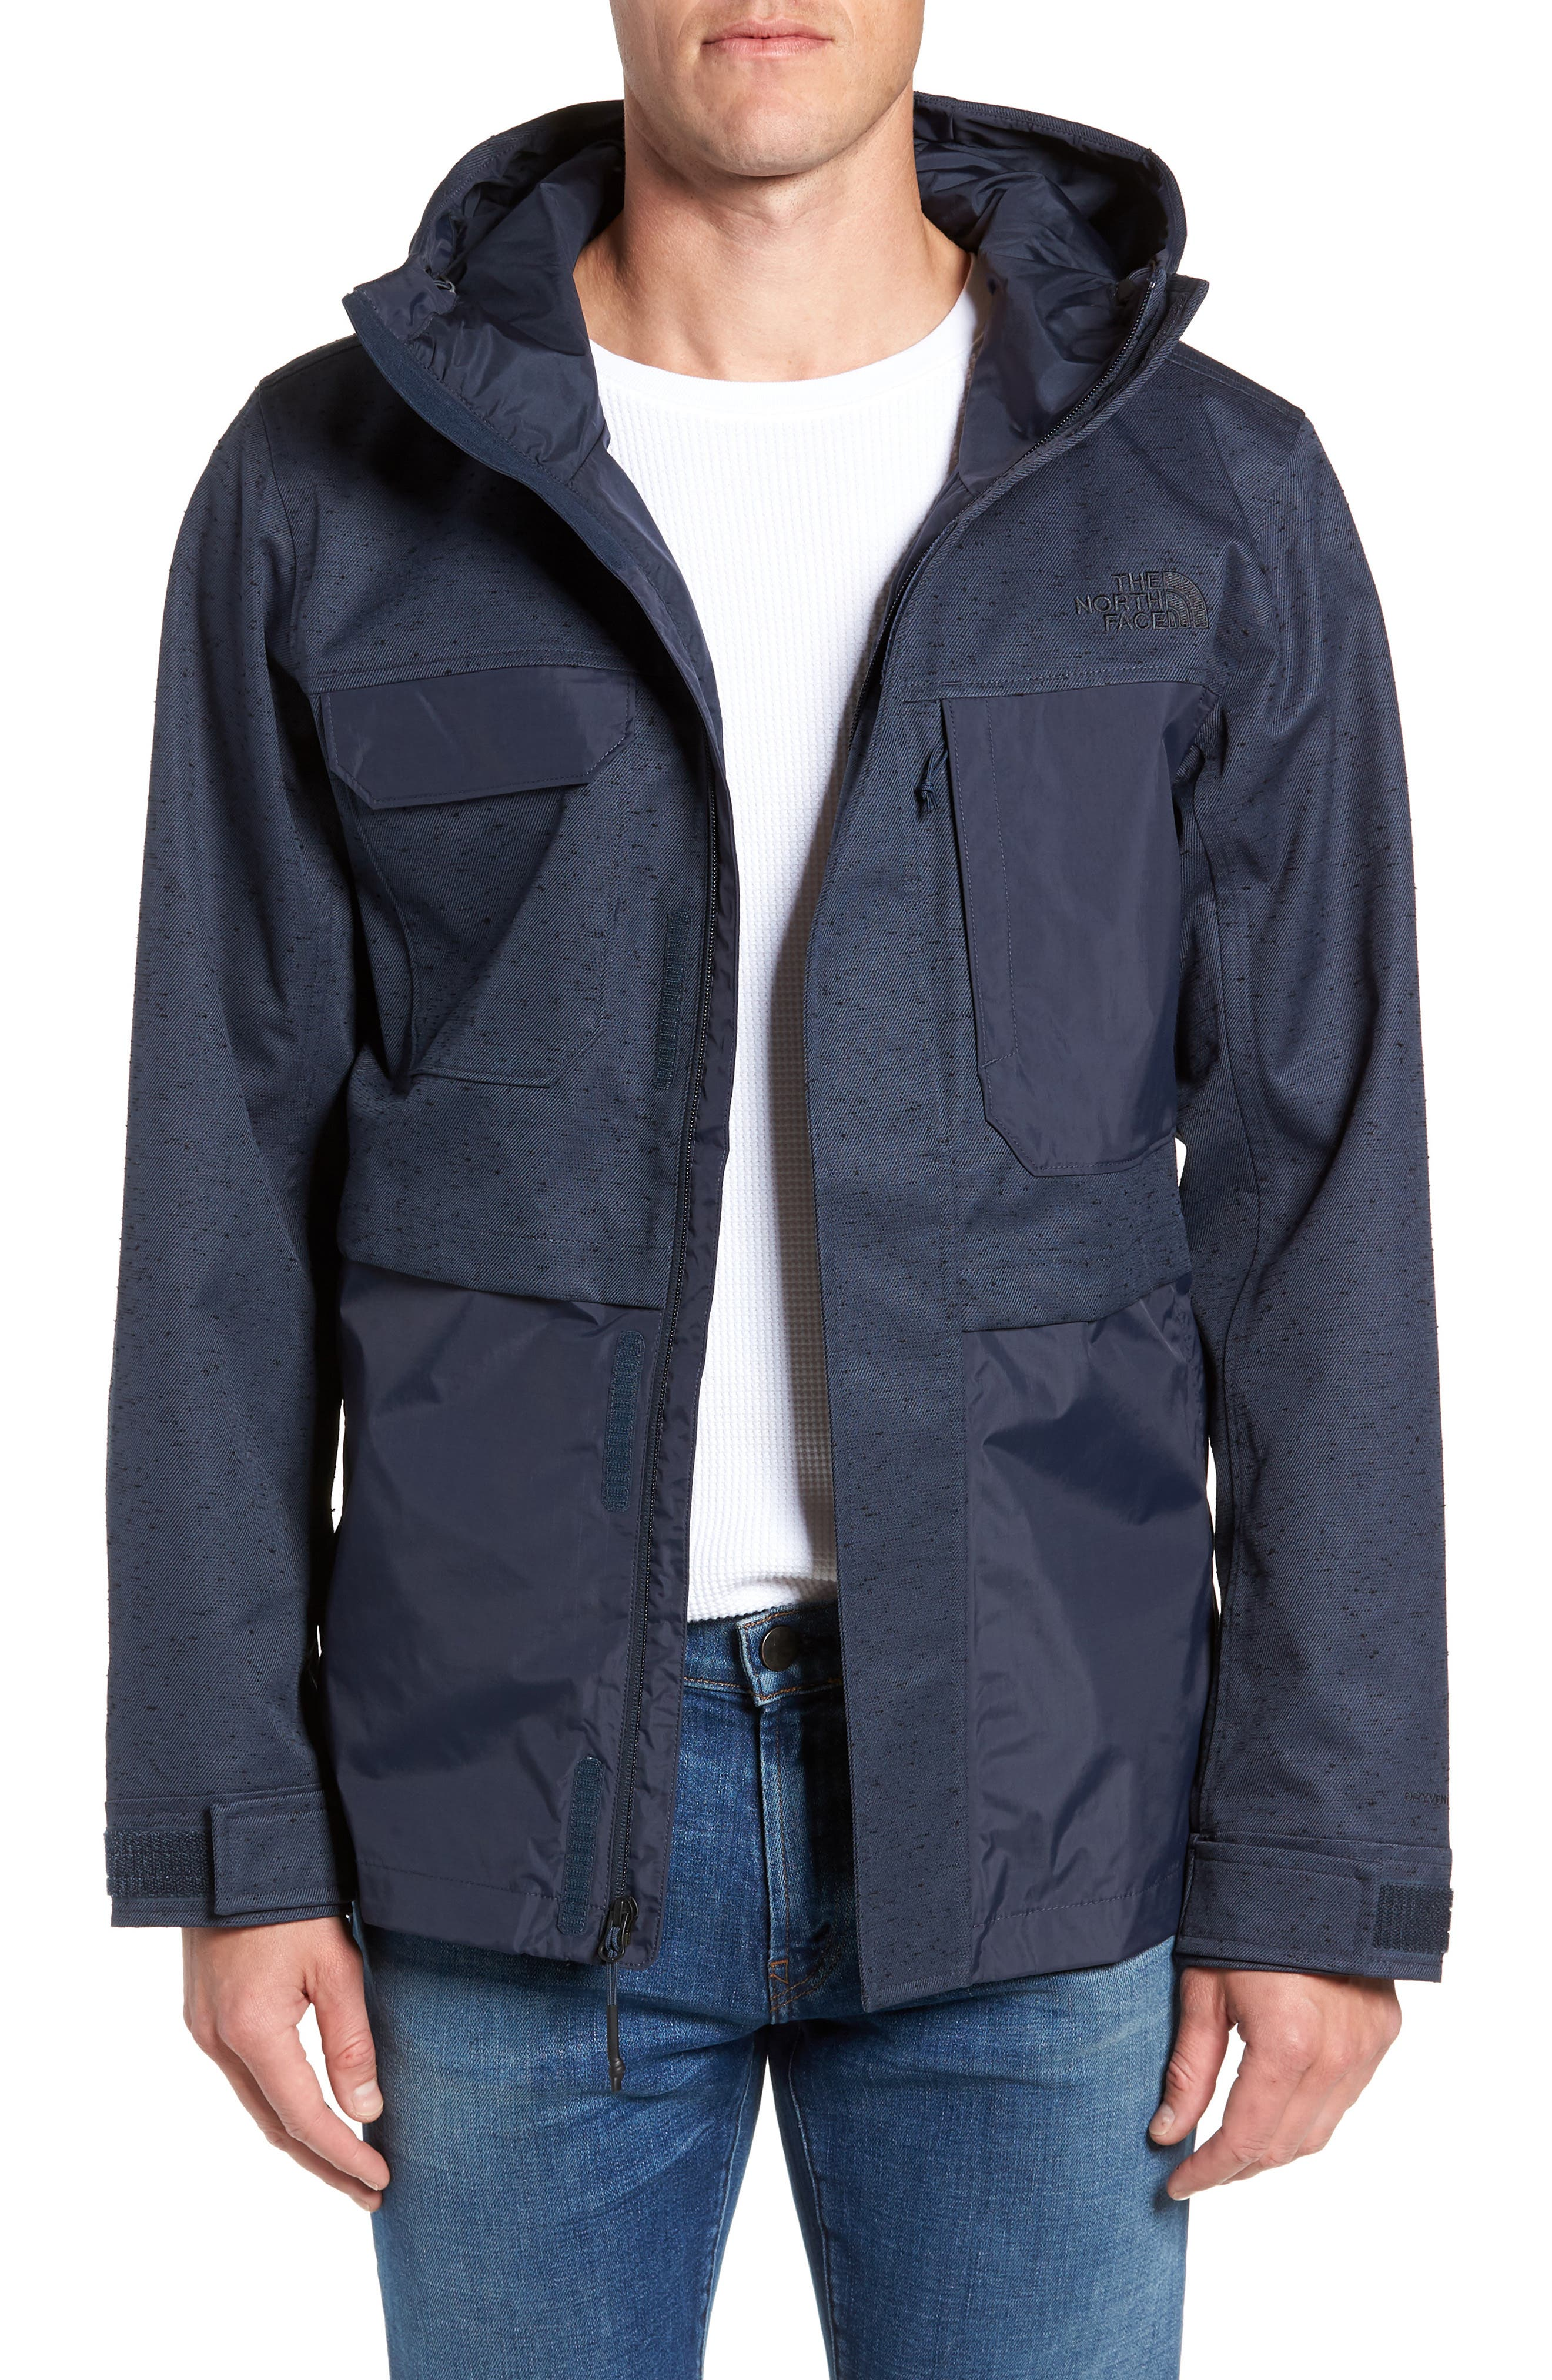 Zoomie Rain Jacket,                             Main thumbnail 1, color,                             URBAN NAVY SLUB